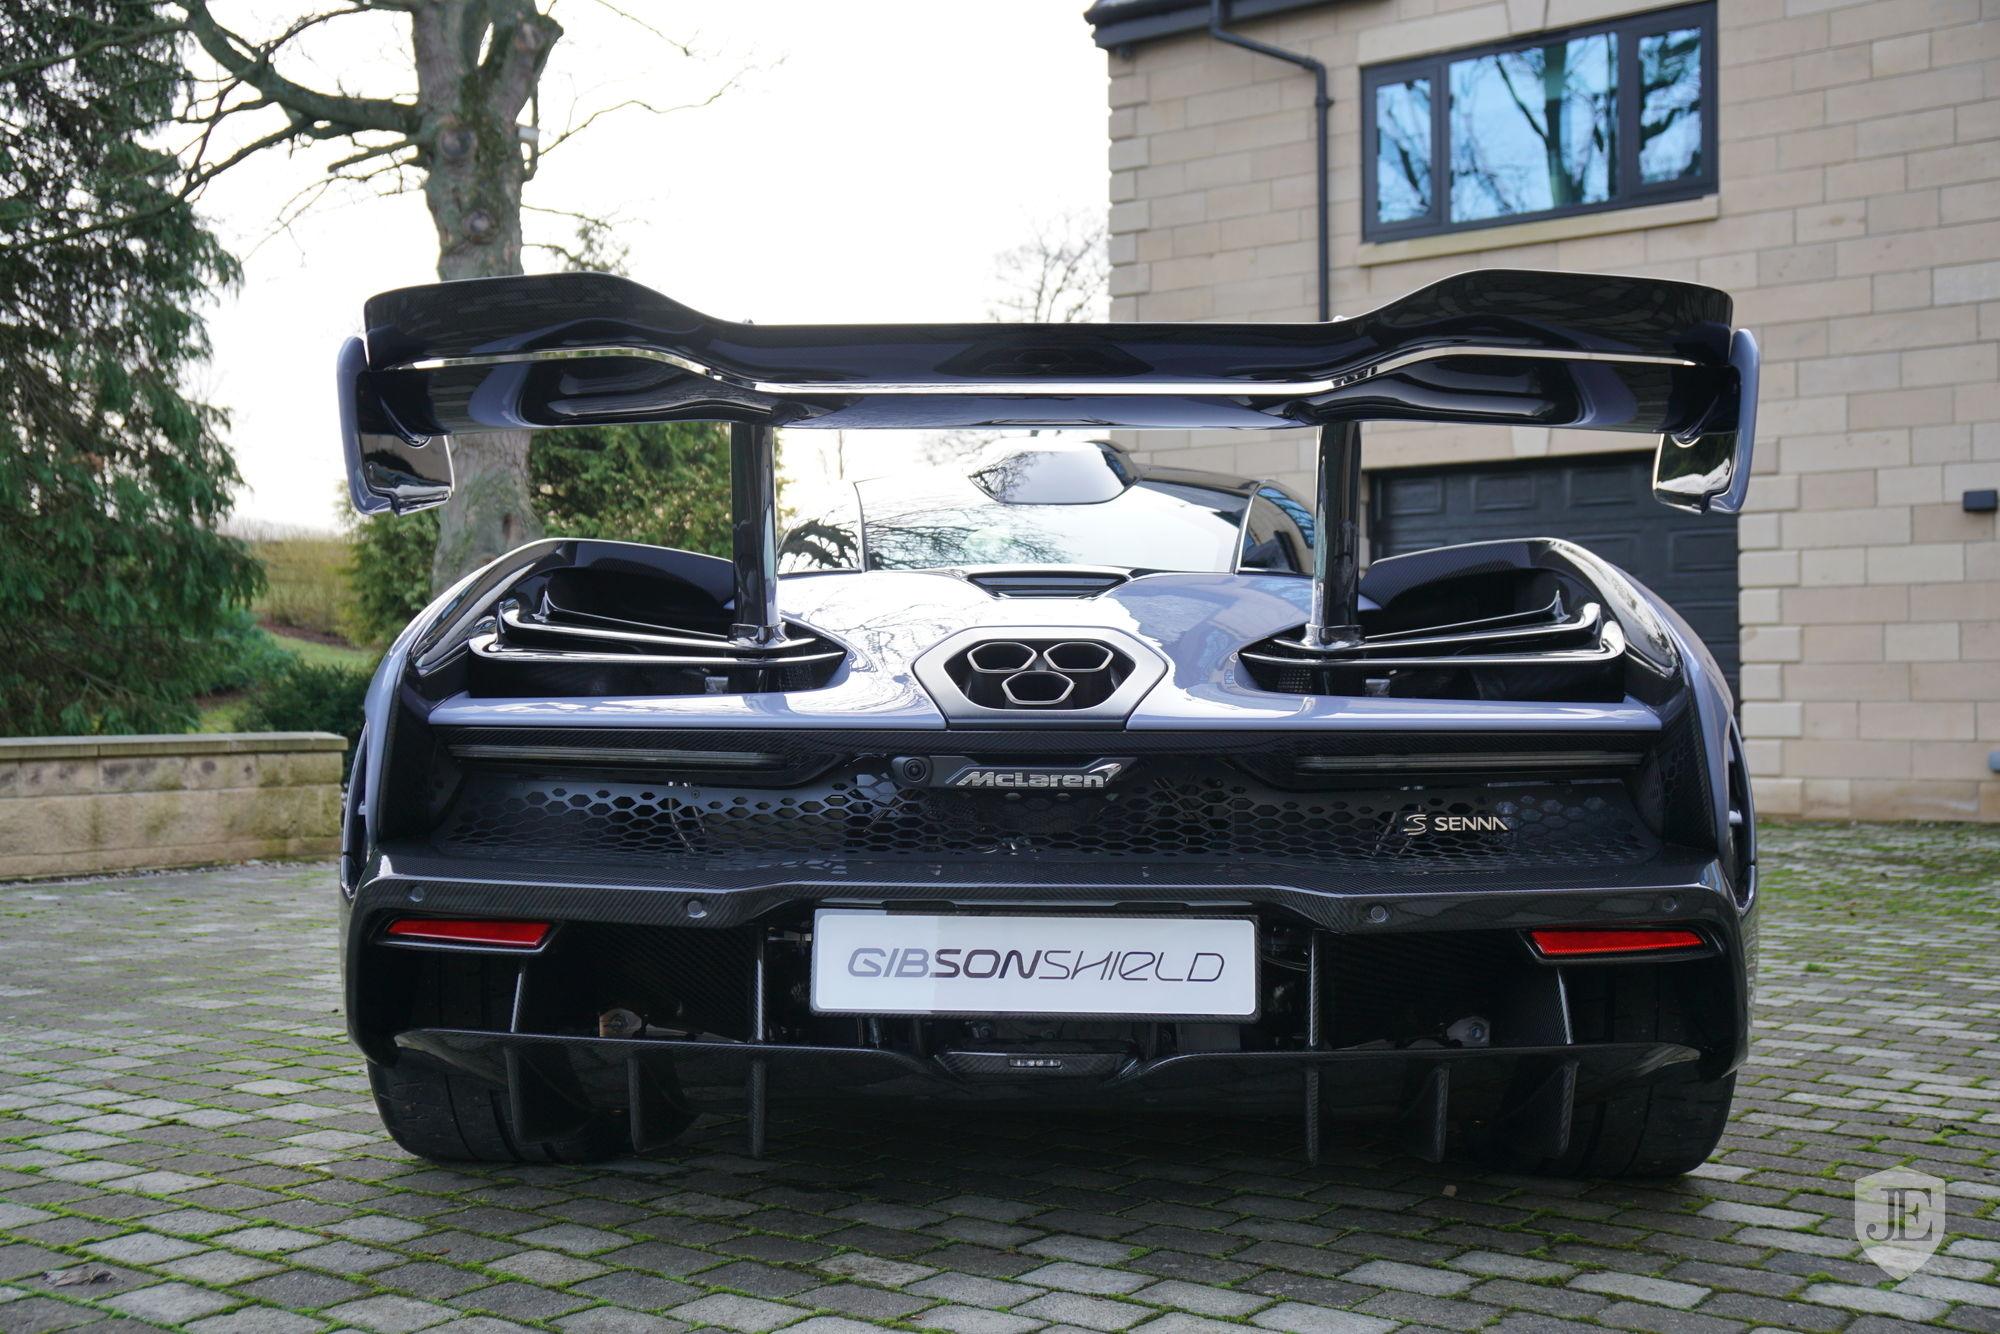 McLaren_Senna_for_sale_0008